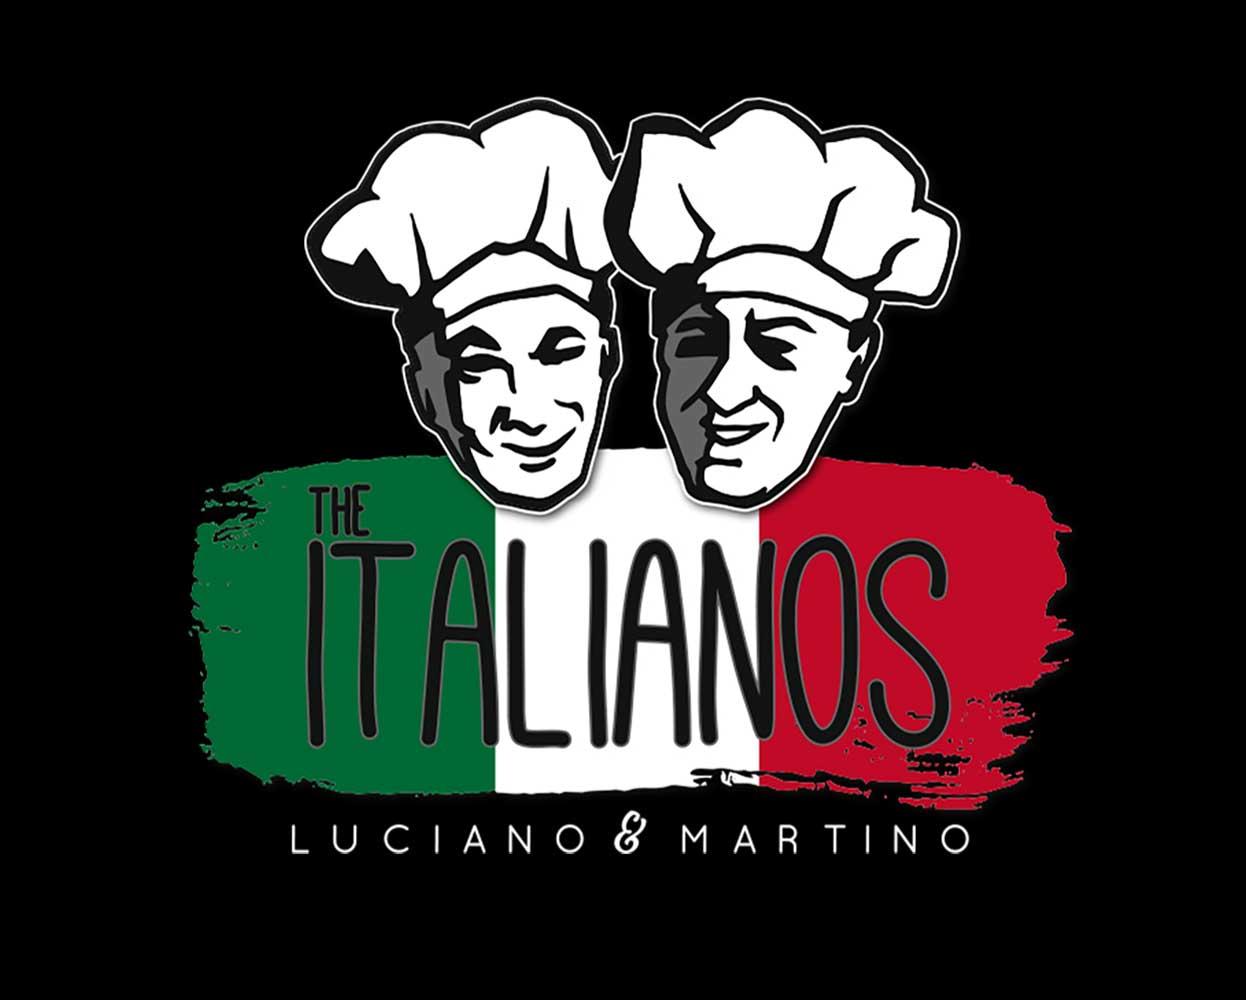 The Italianos branding - logo